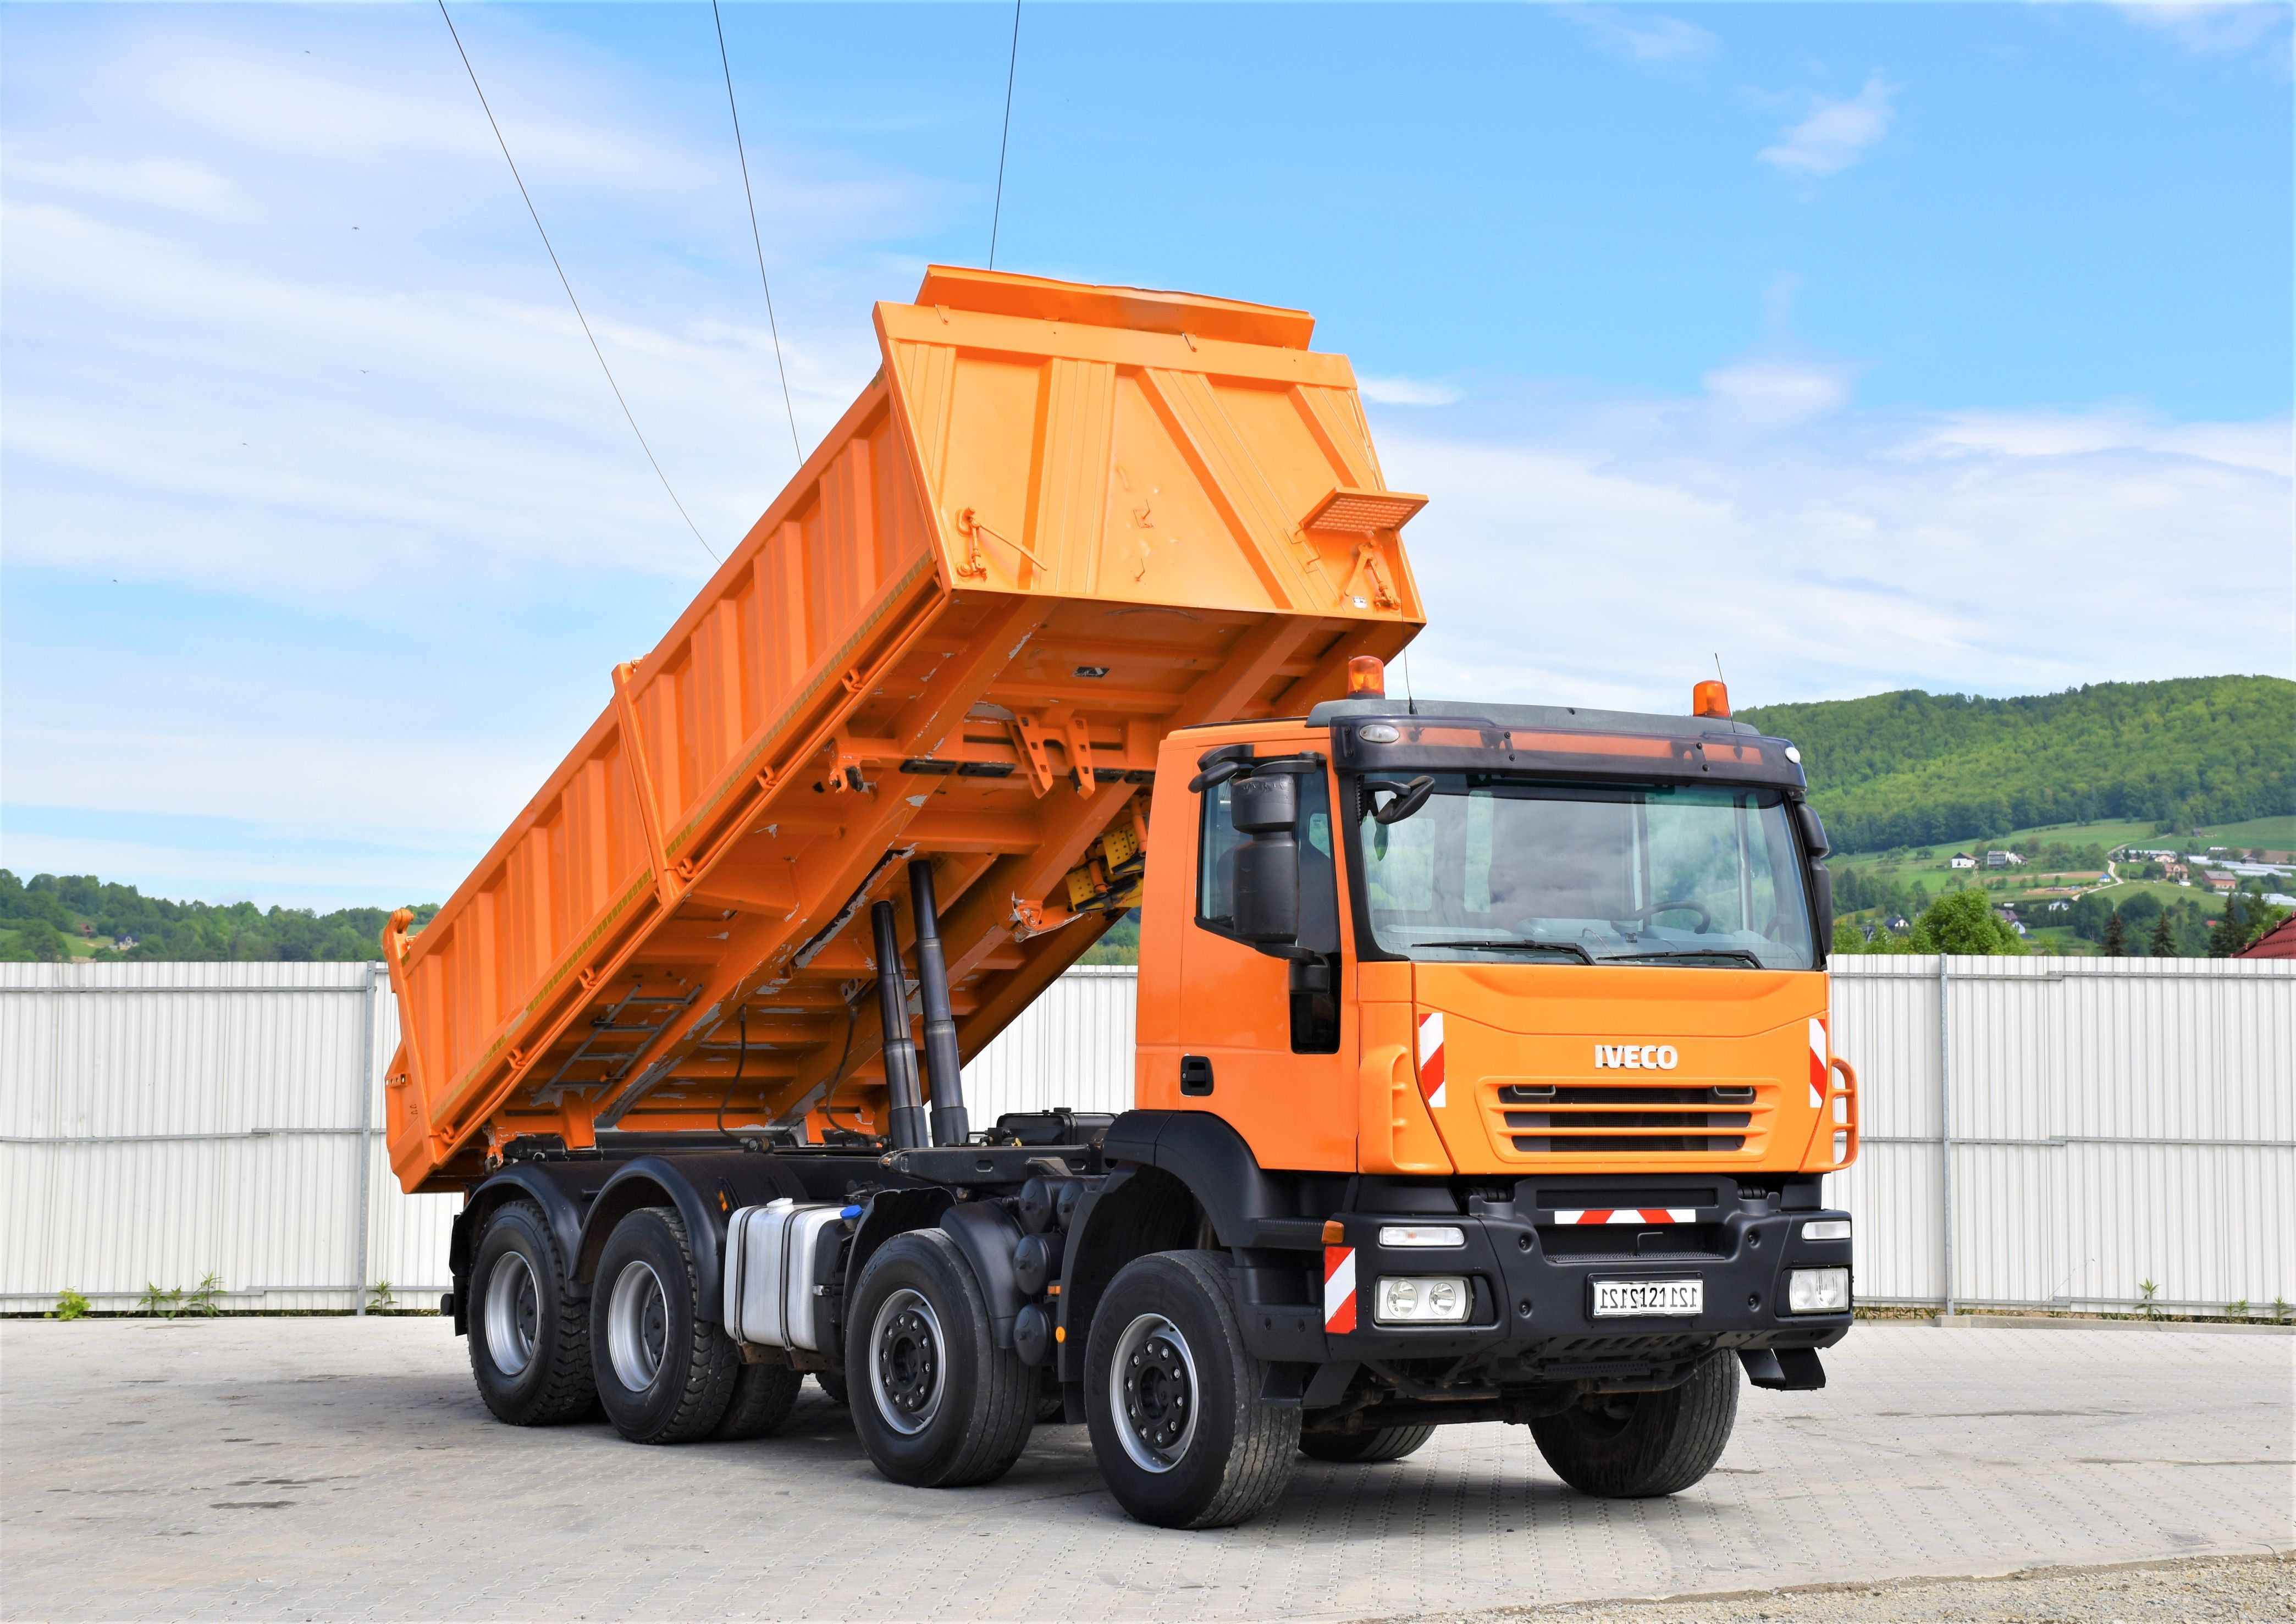 2008-iveco-trakker-450-381290-equipment-cover-image